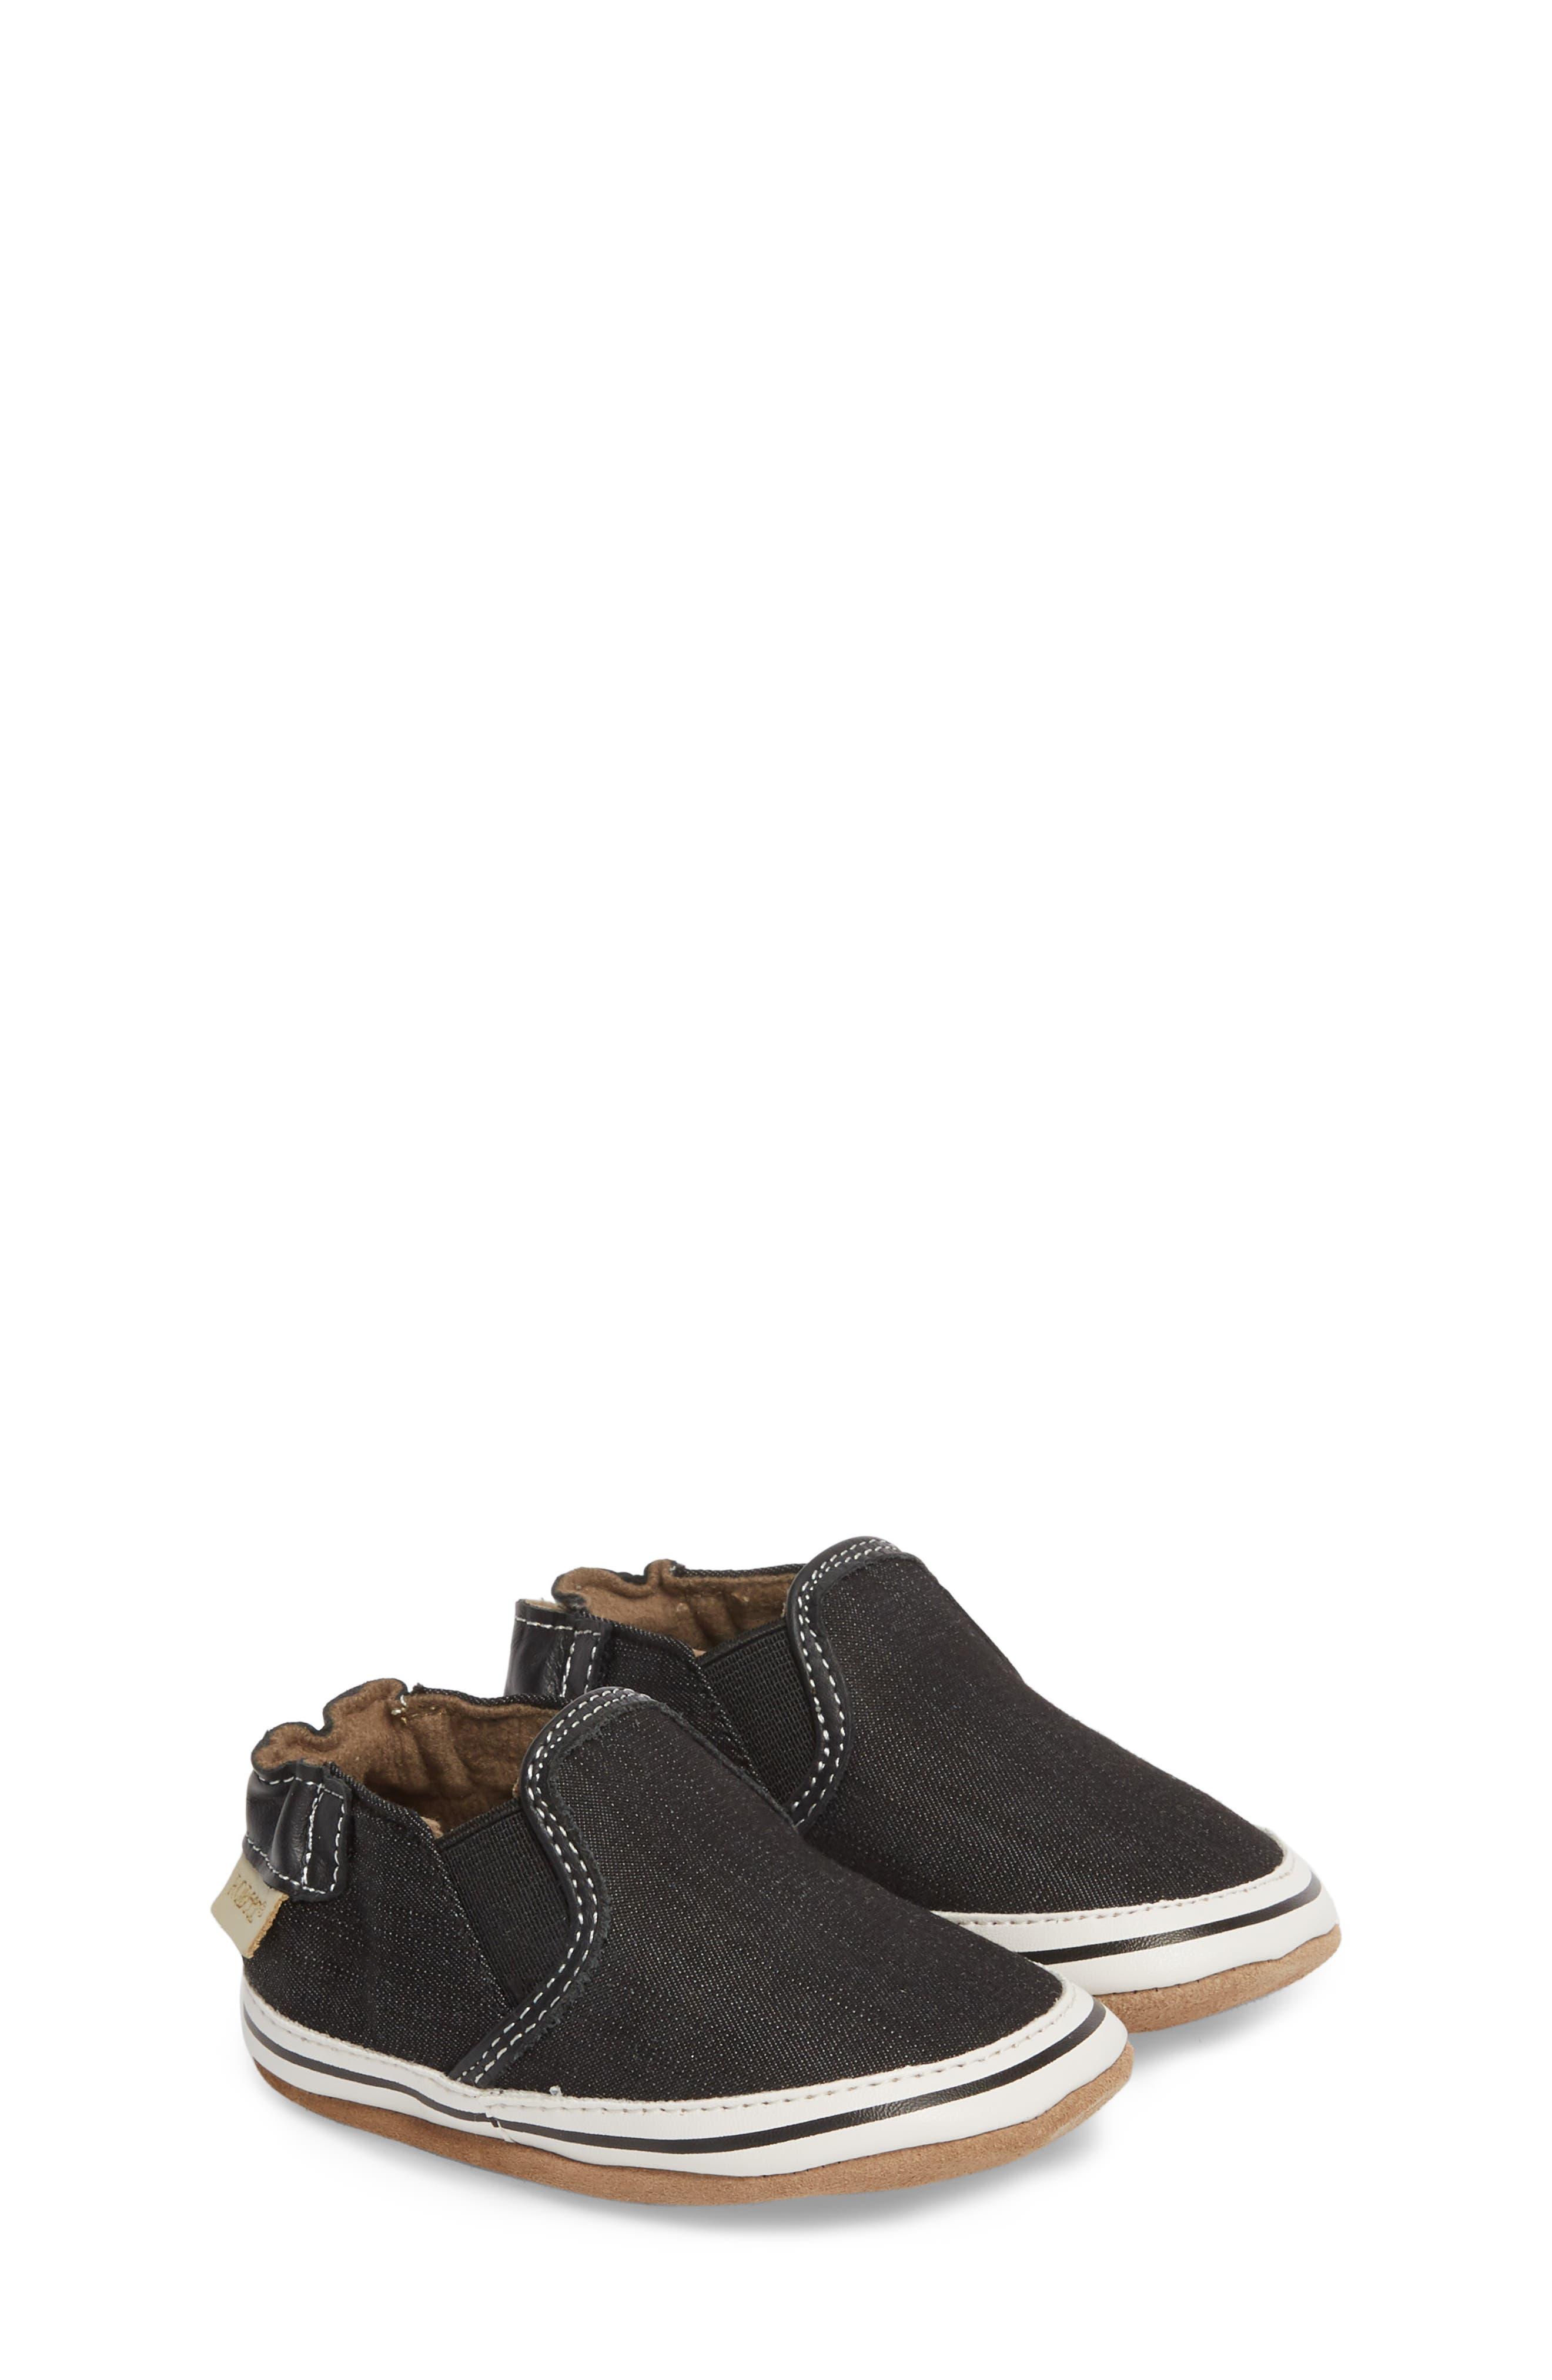 ROBEEZ<SUP>®</SUP> Liam Slip-On Crib Sneaker, Main, color, BLACK